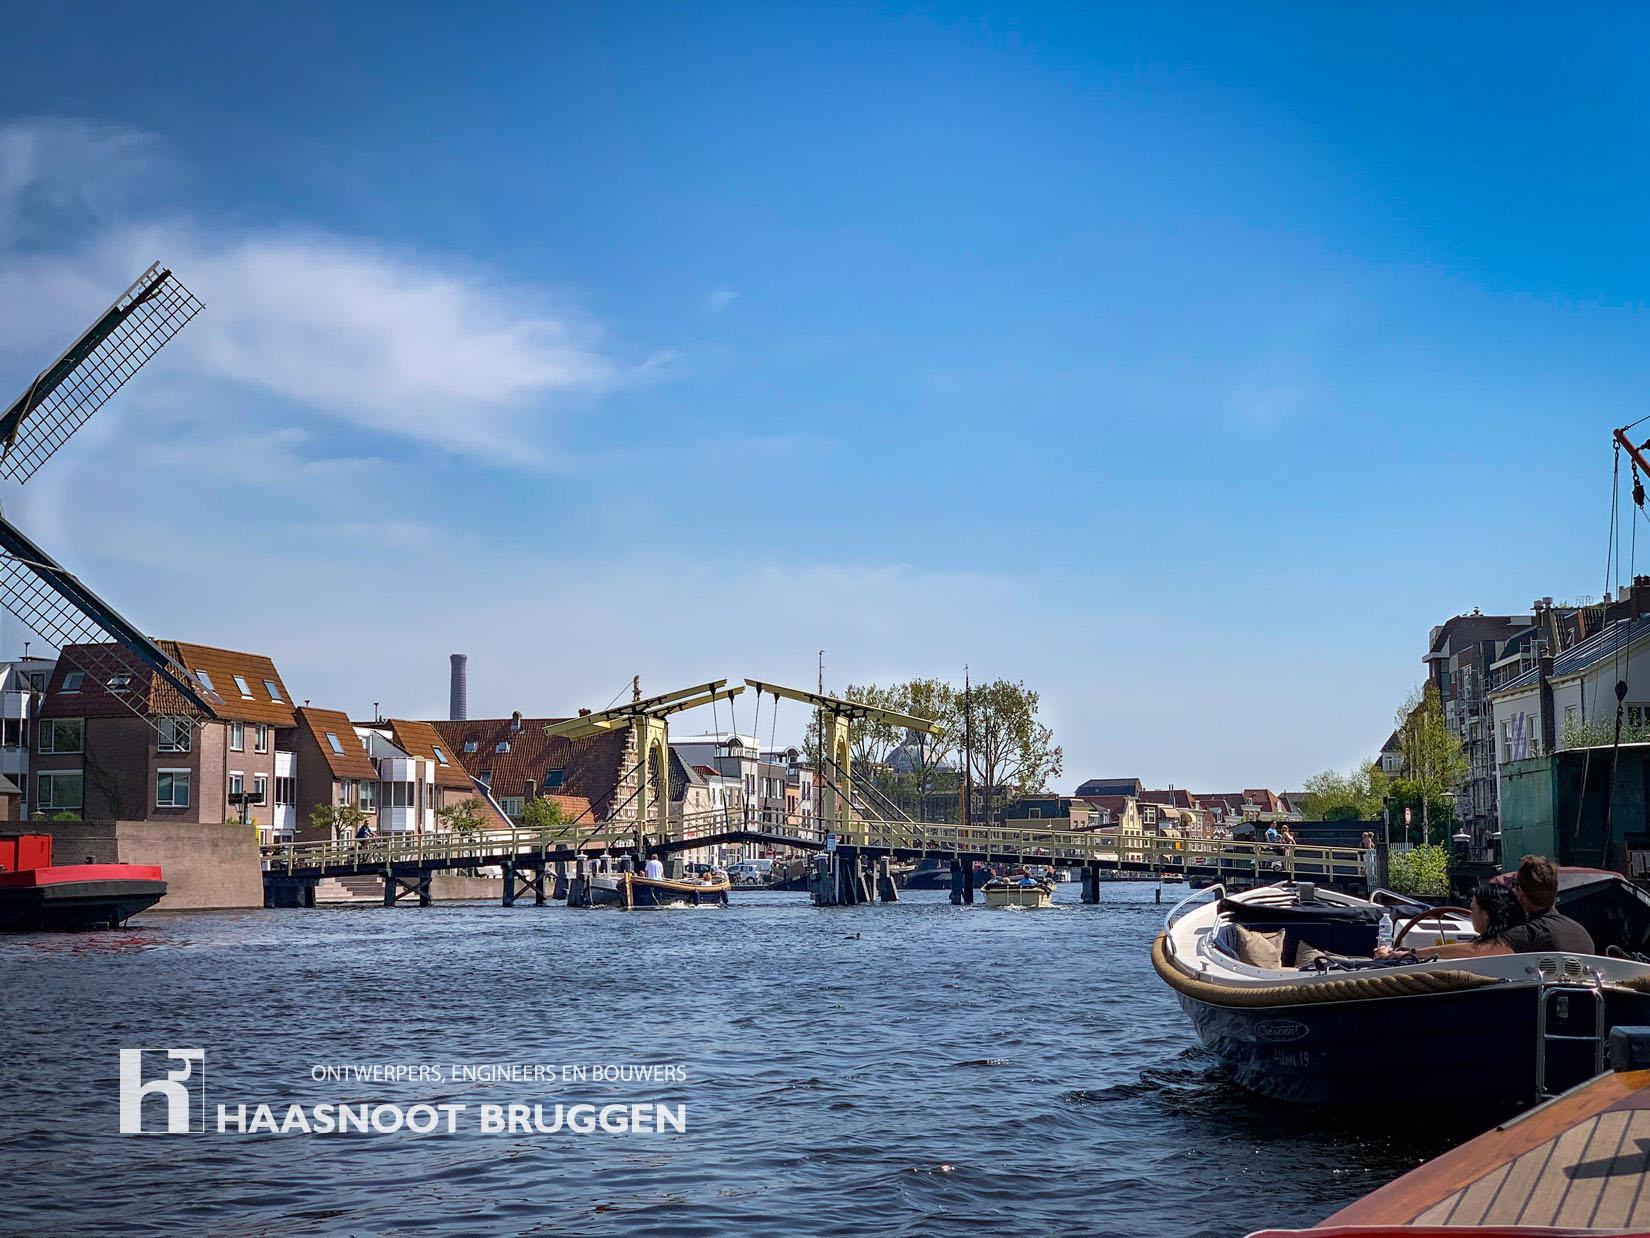 Rembrandtbrug_leiden_haasnoot_bruggen